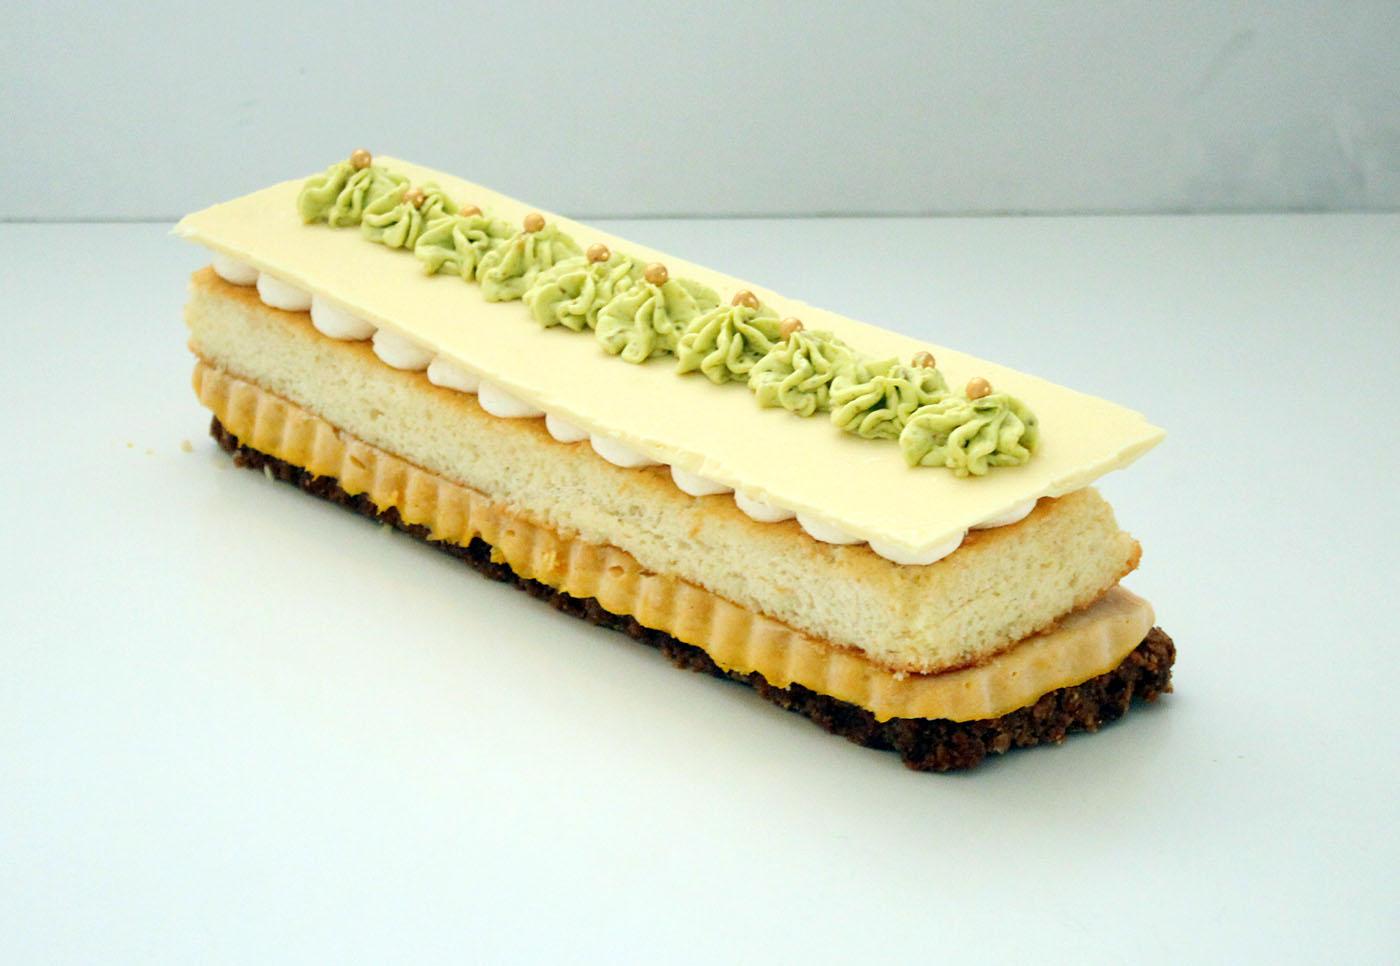 IMG 9244 - עוגת שכבות אקזותית